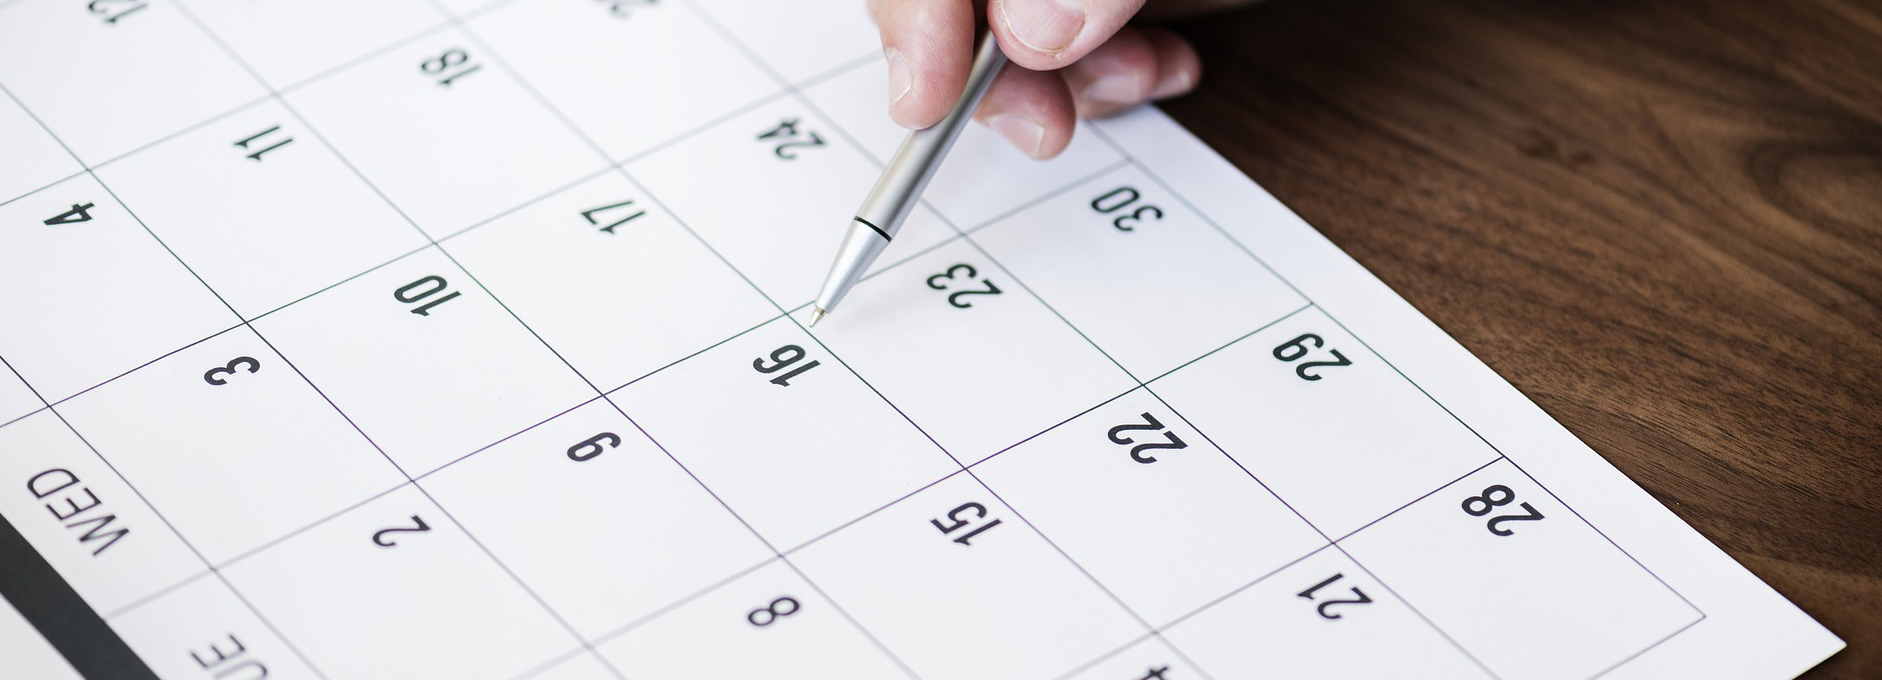 BCS UK Cardiology Calendar